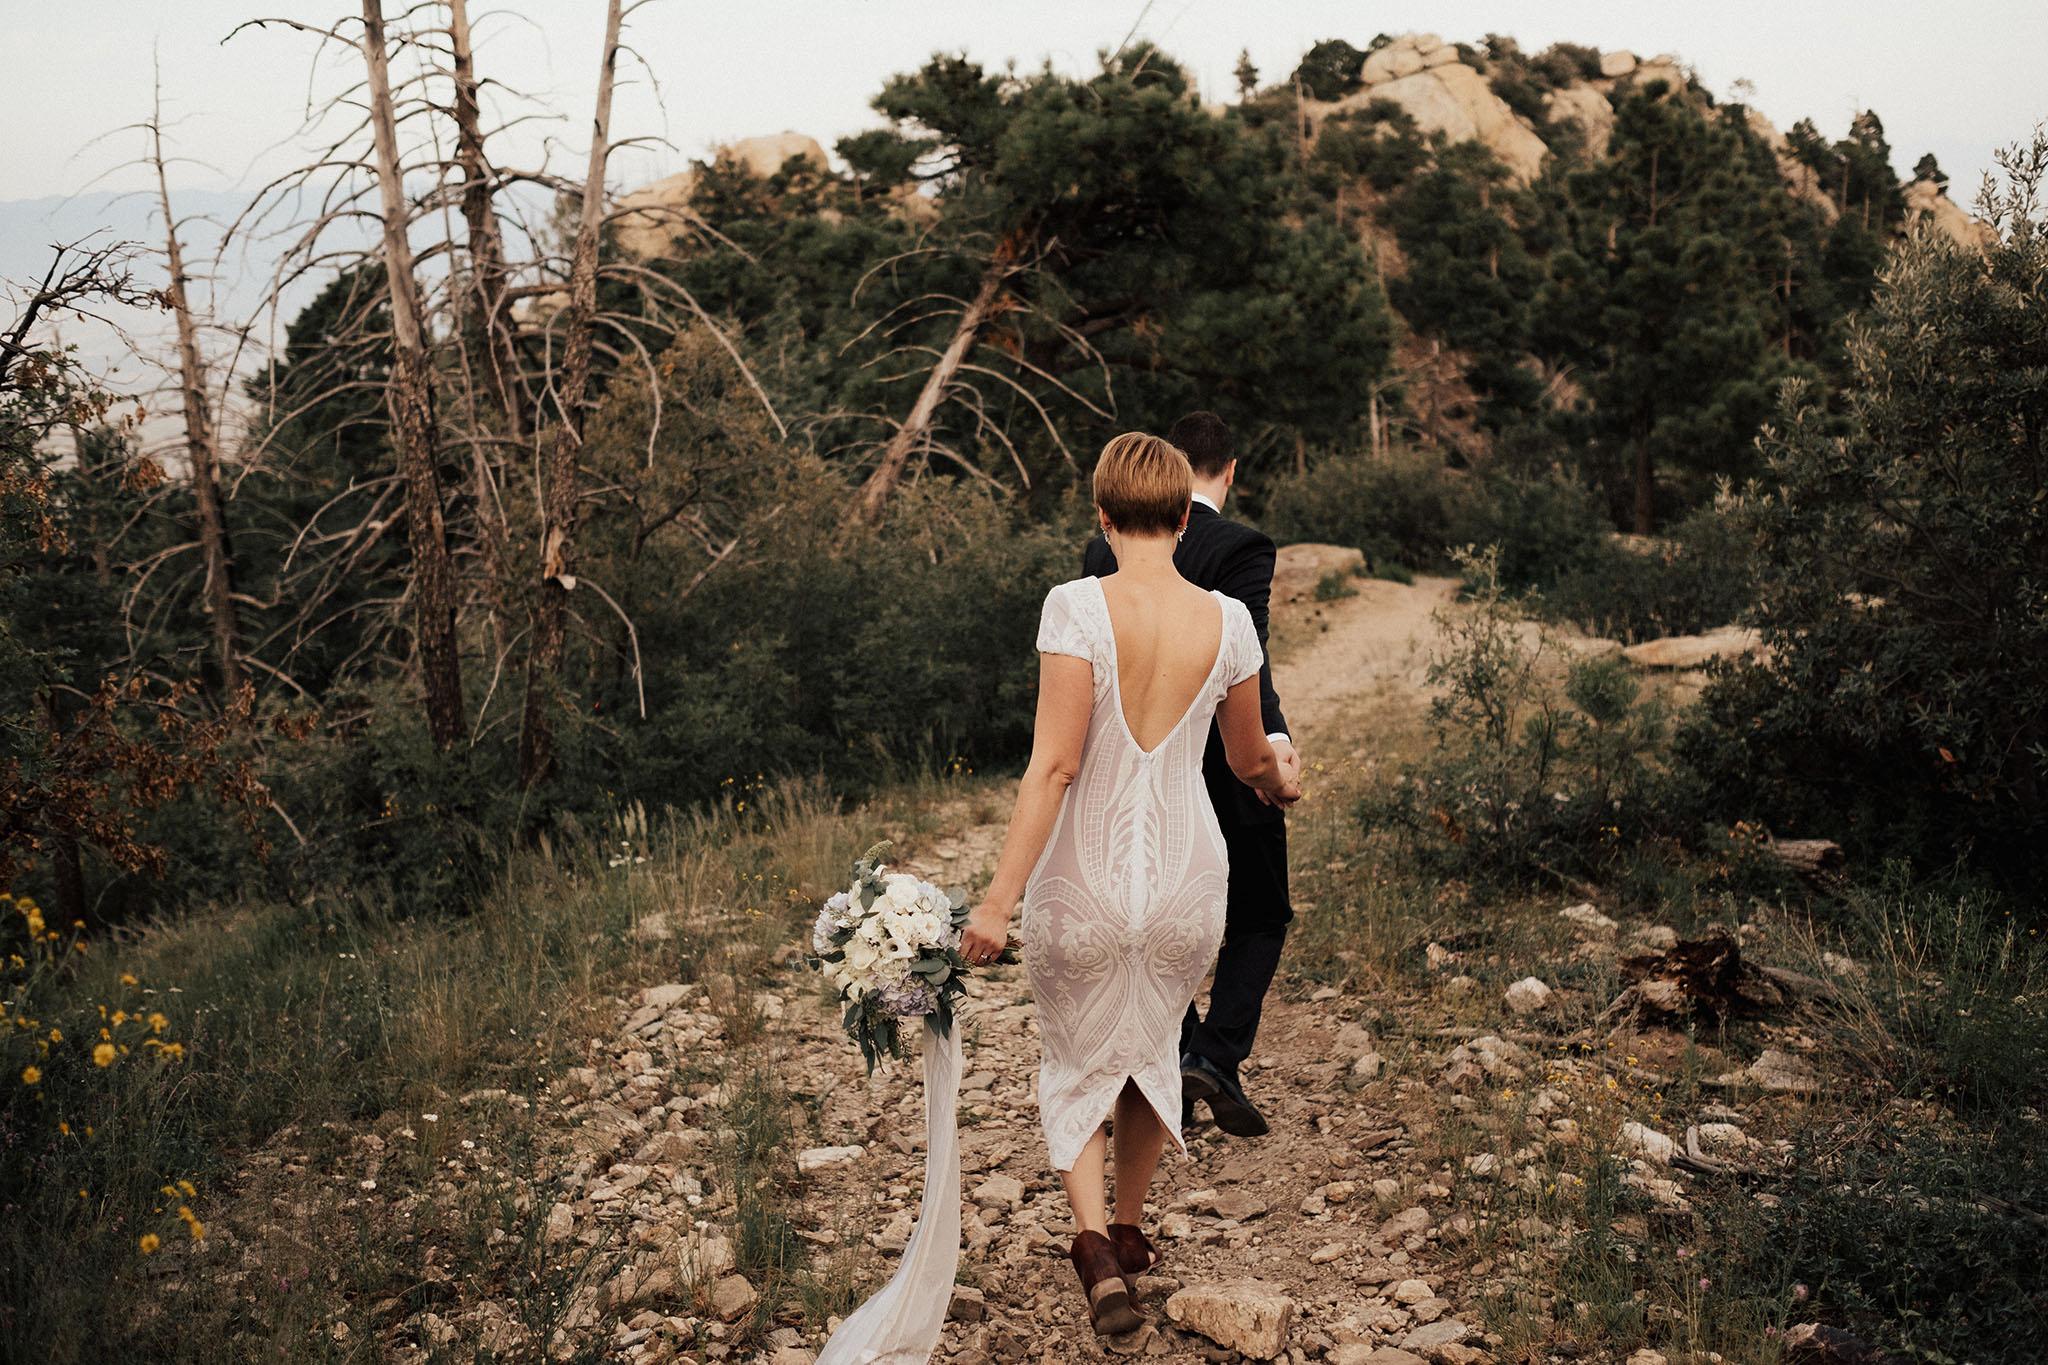 Arizona-Intimate-Elopement-Adventure-Photographer-Mount-Lemmon (12).jpg